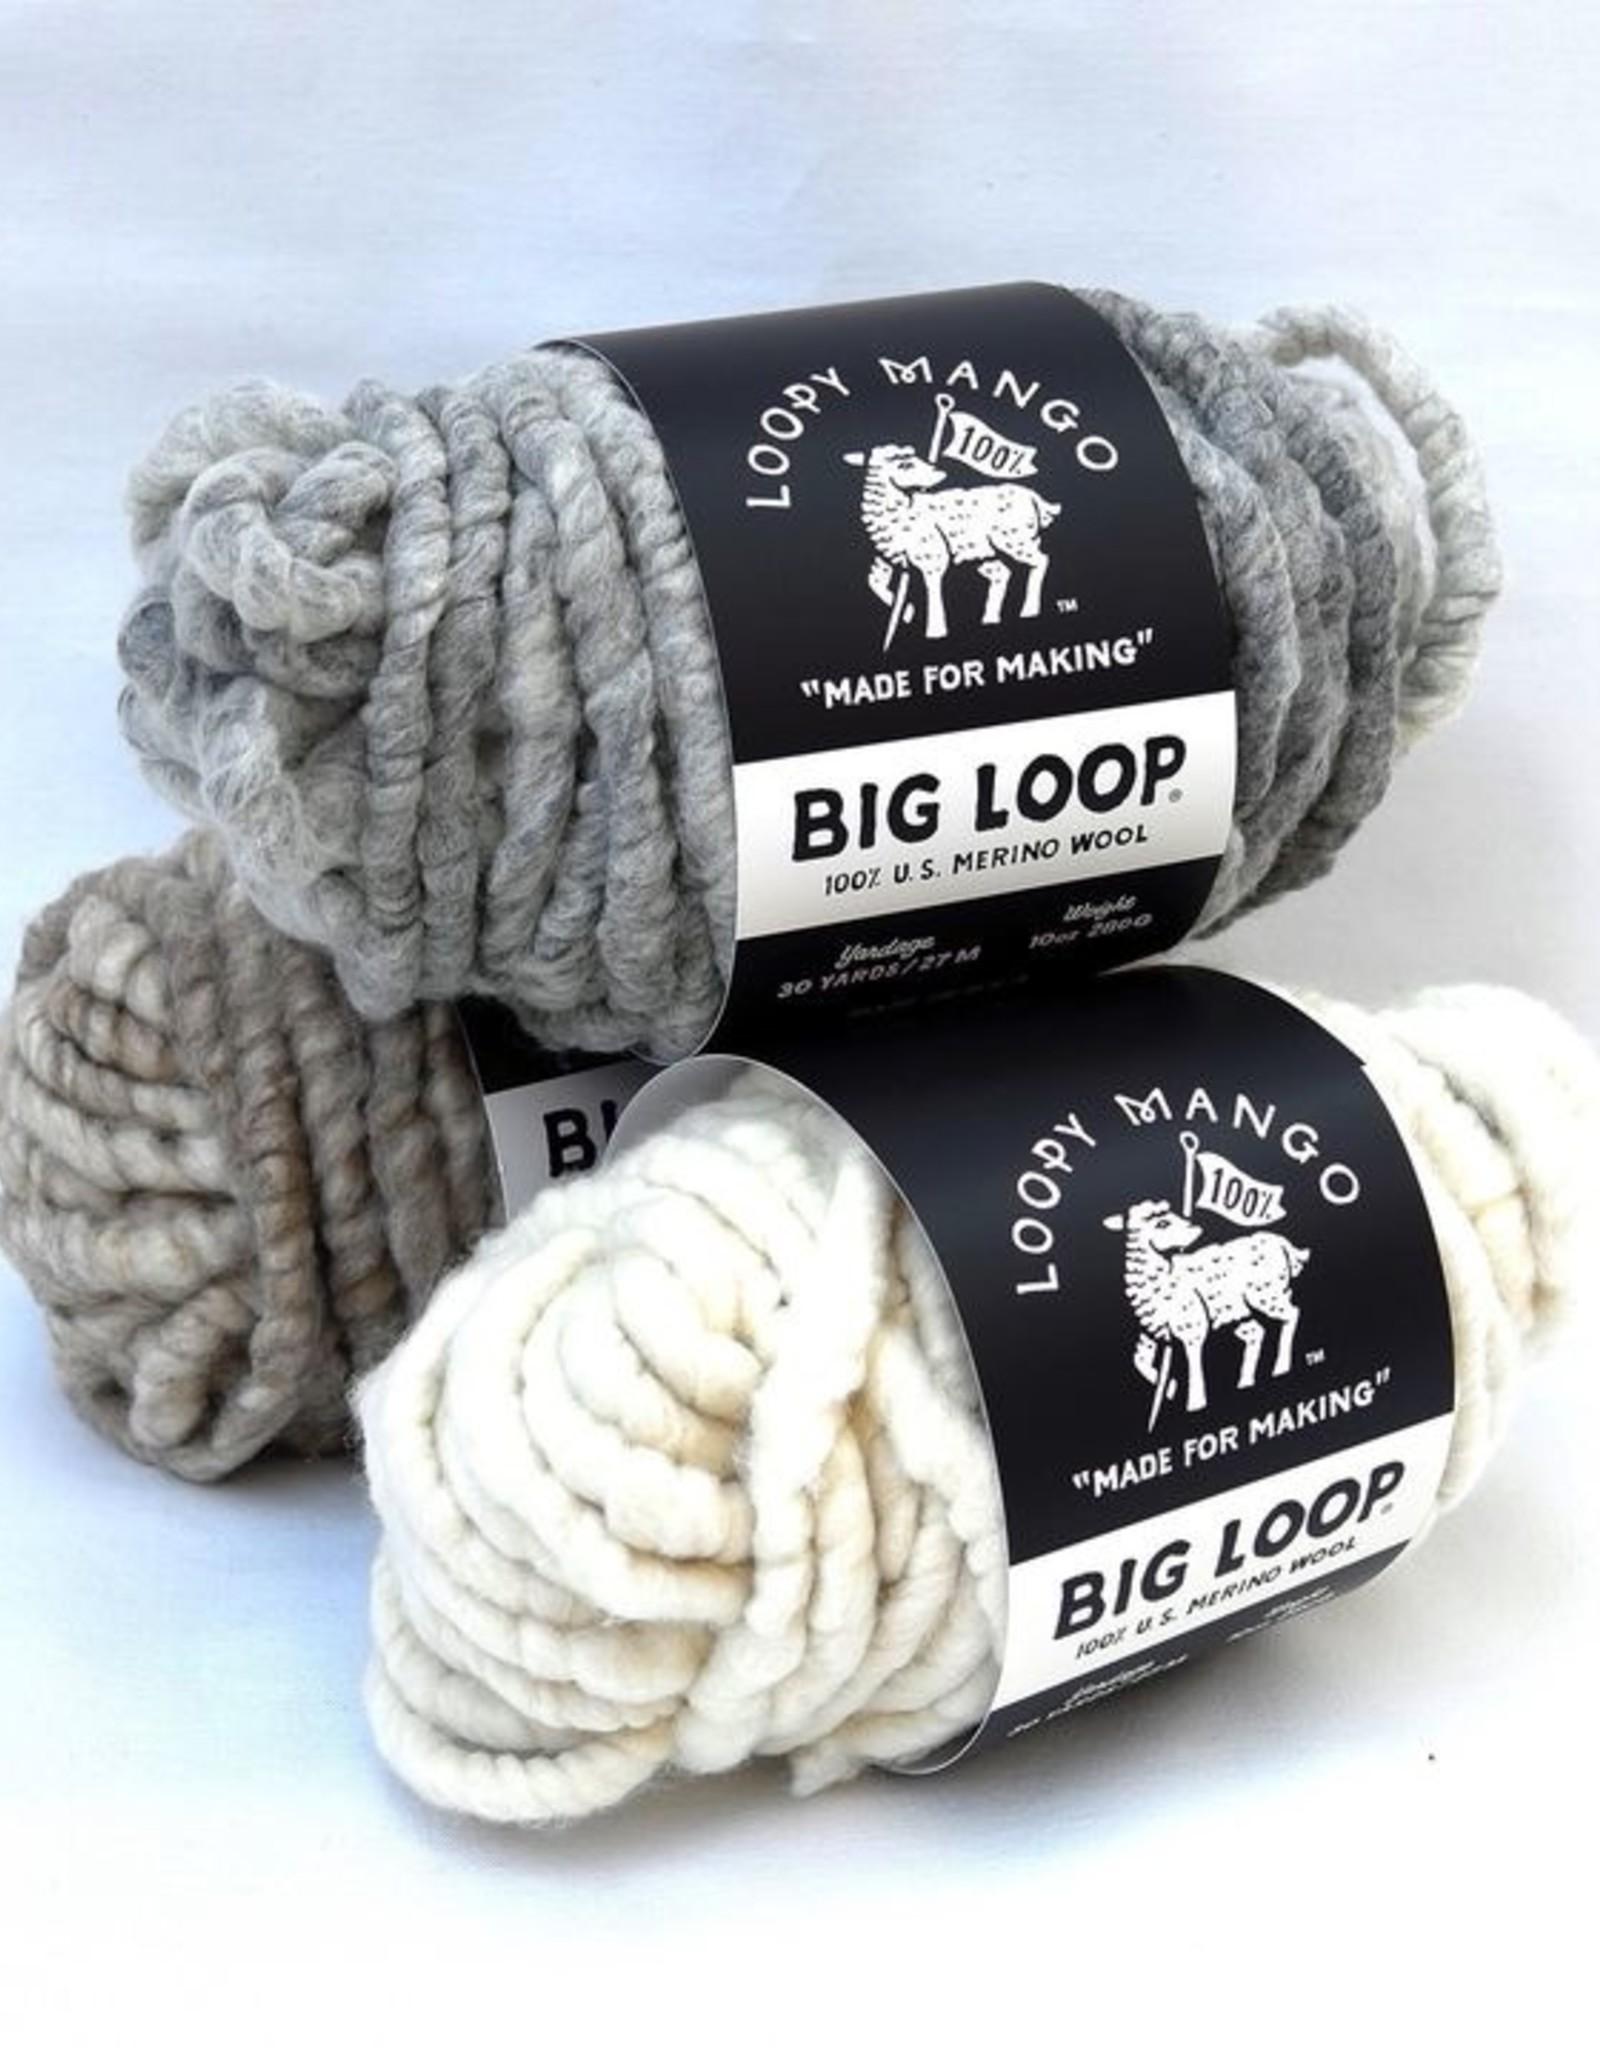 Loopy Mango Big Loop Mini by Loopy Mango